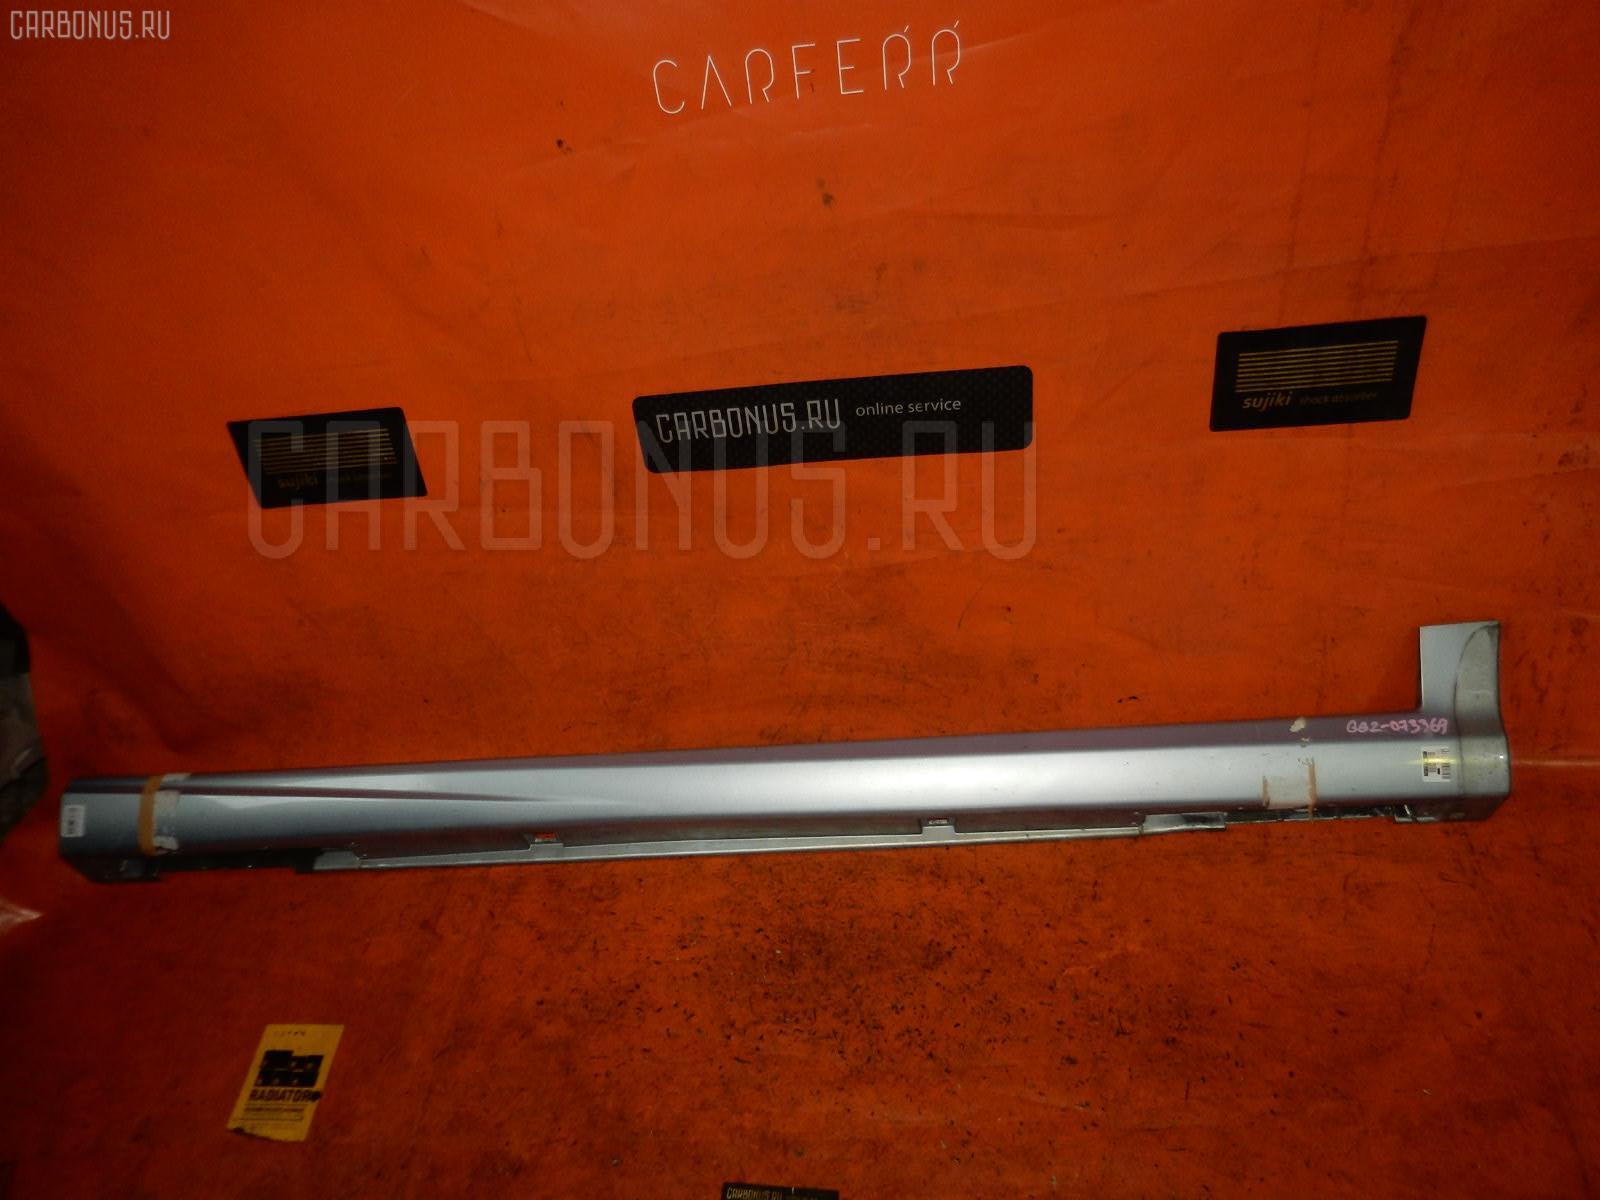 Порог кузова пластиковый ( обвес ) SUBARU IMPREZA WAGON GG2. Фото 6